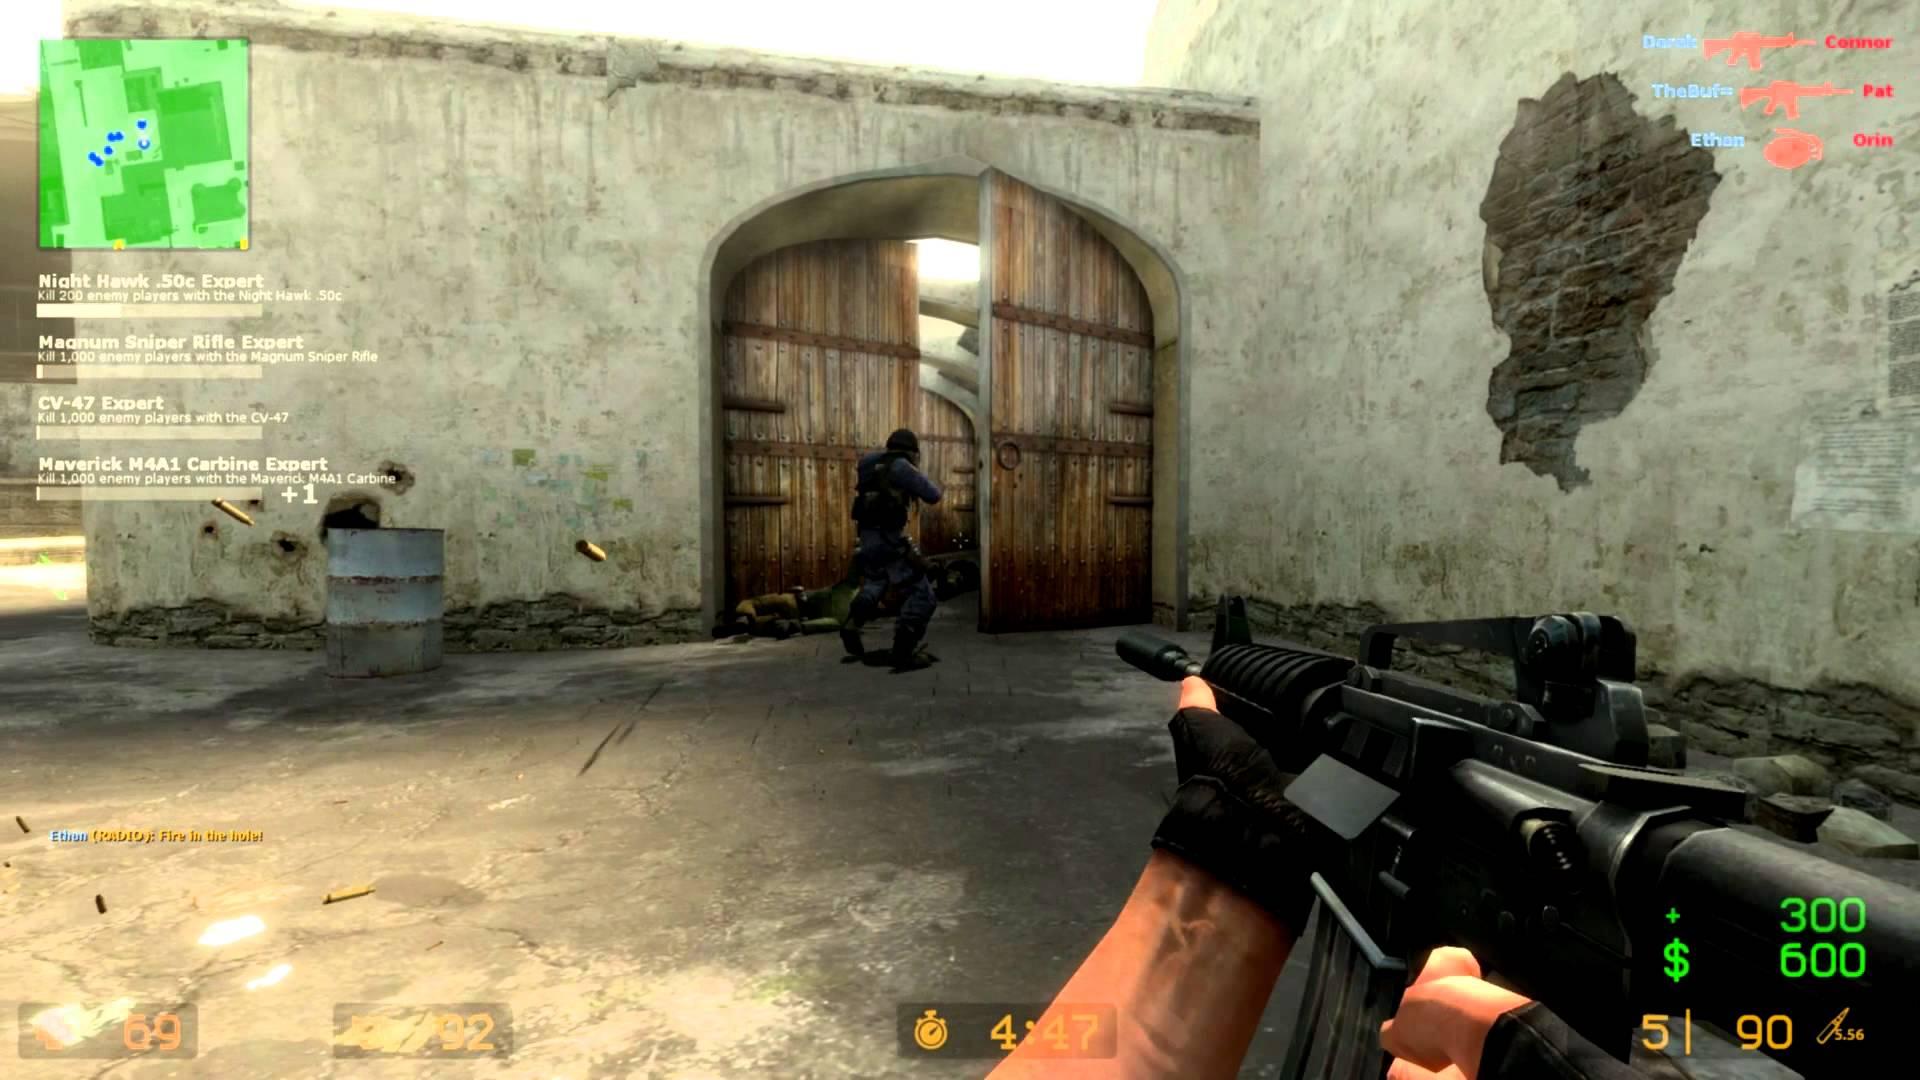 Counter Strike Source - Free Download PC Game (Full Version)